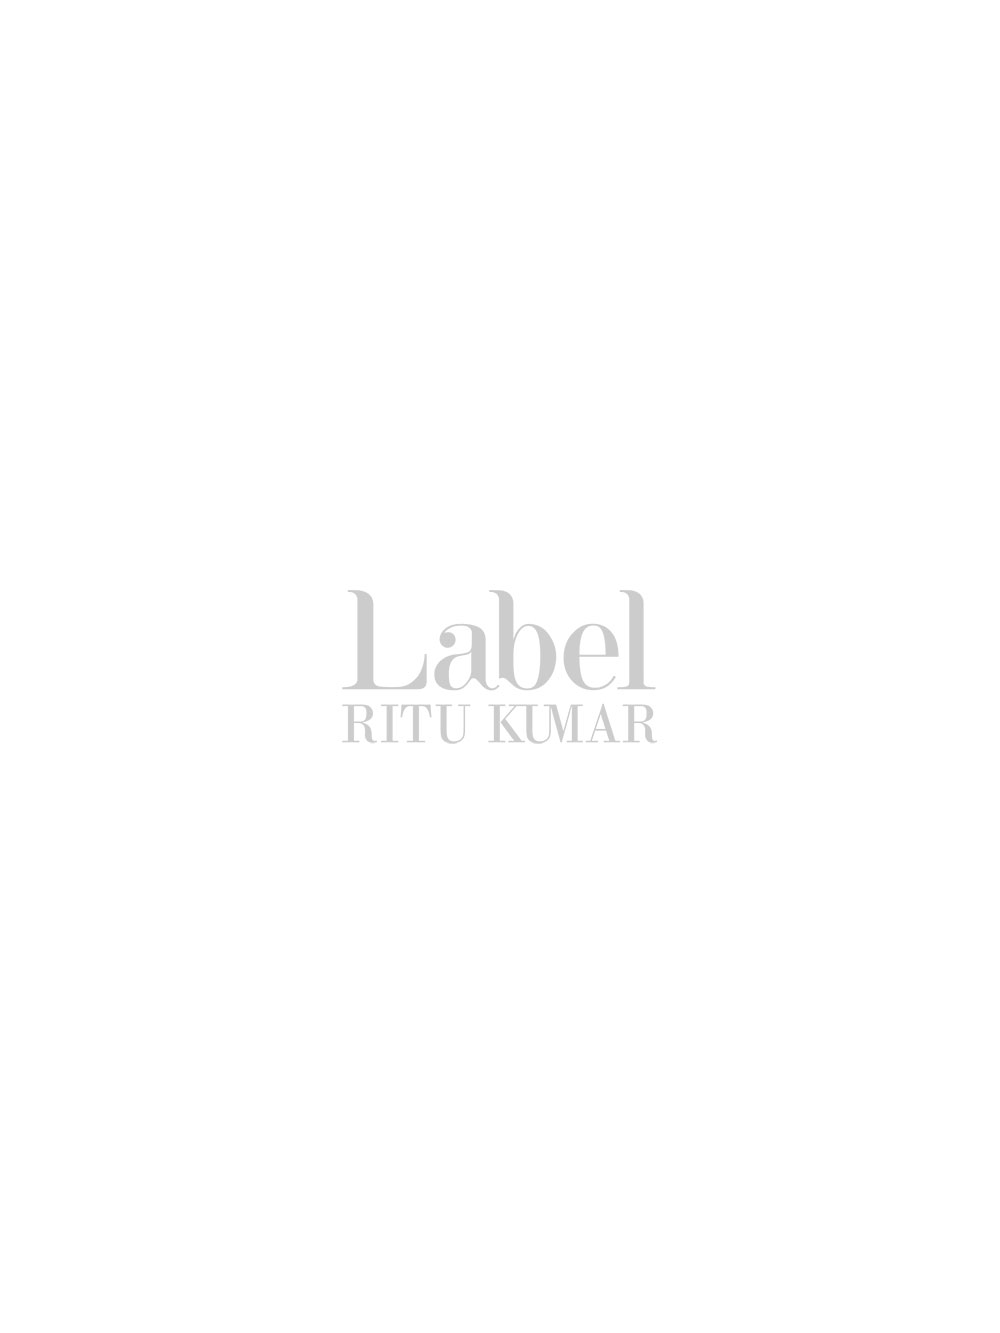 Off-White Embellished Crop Top